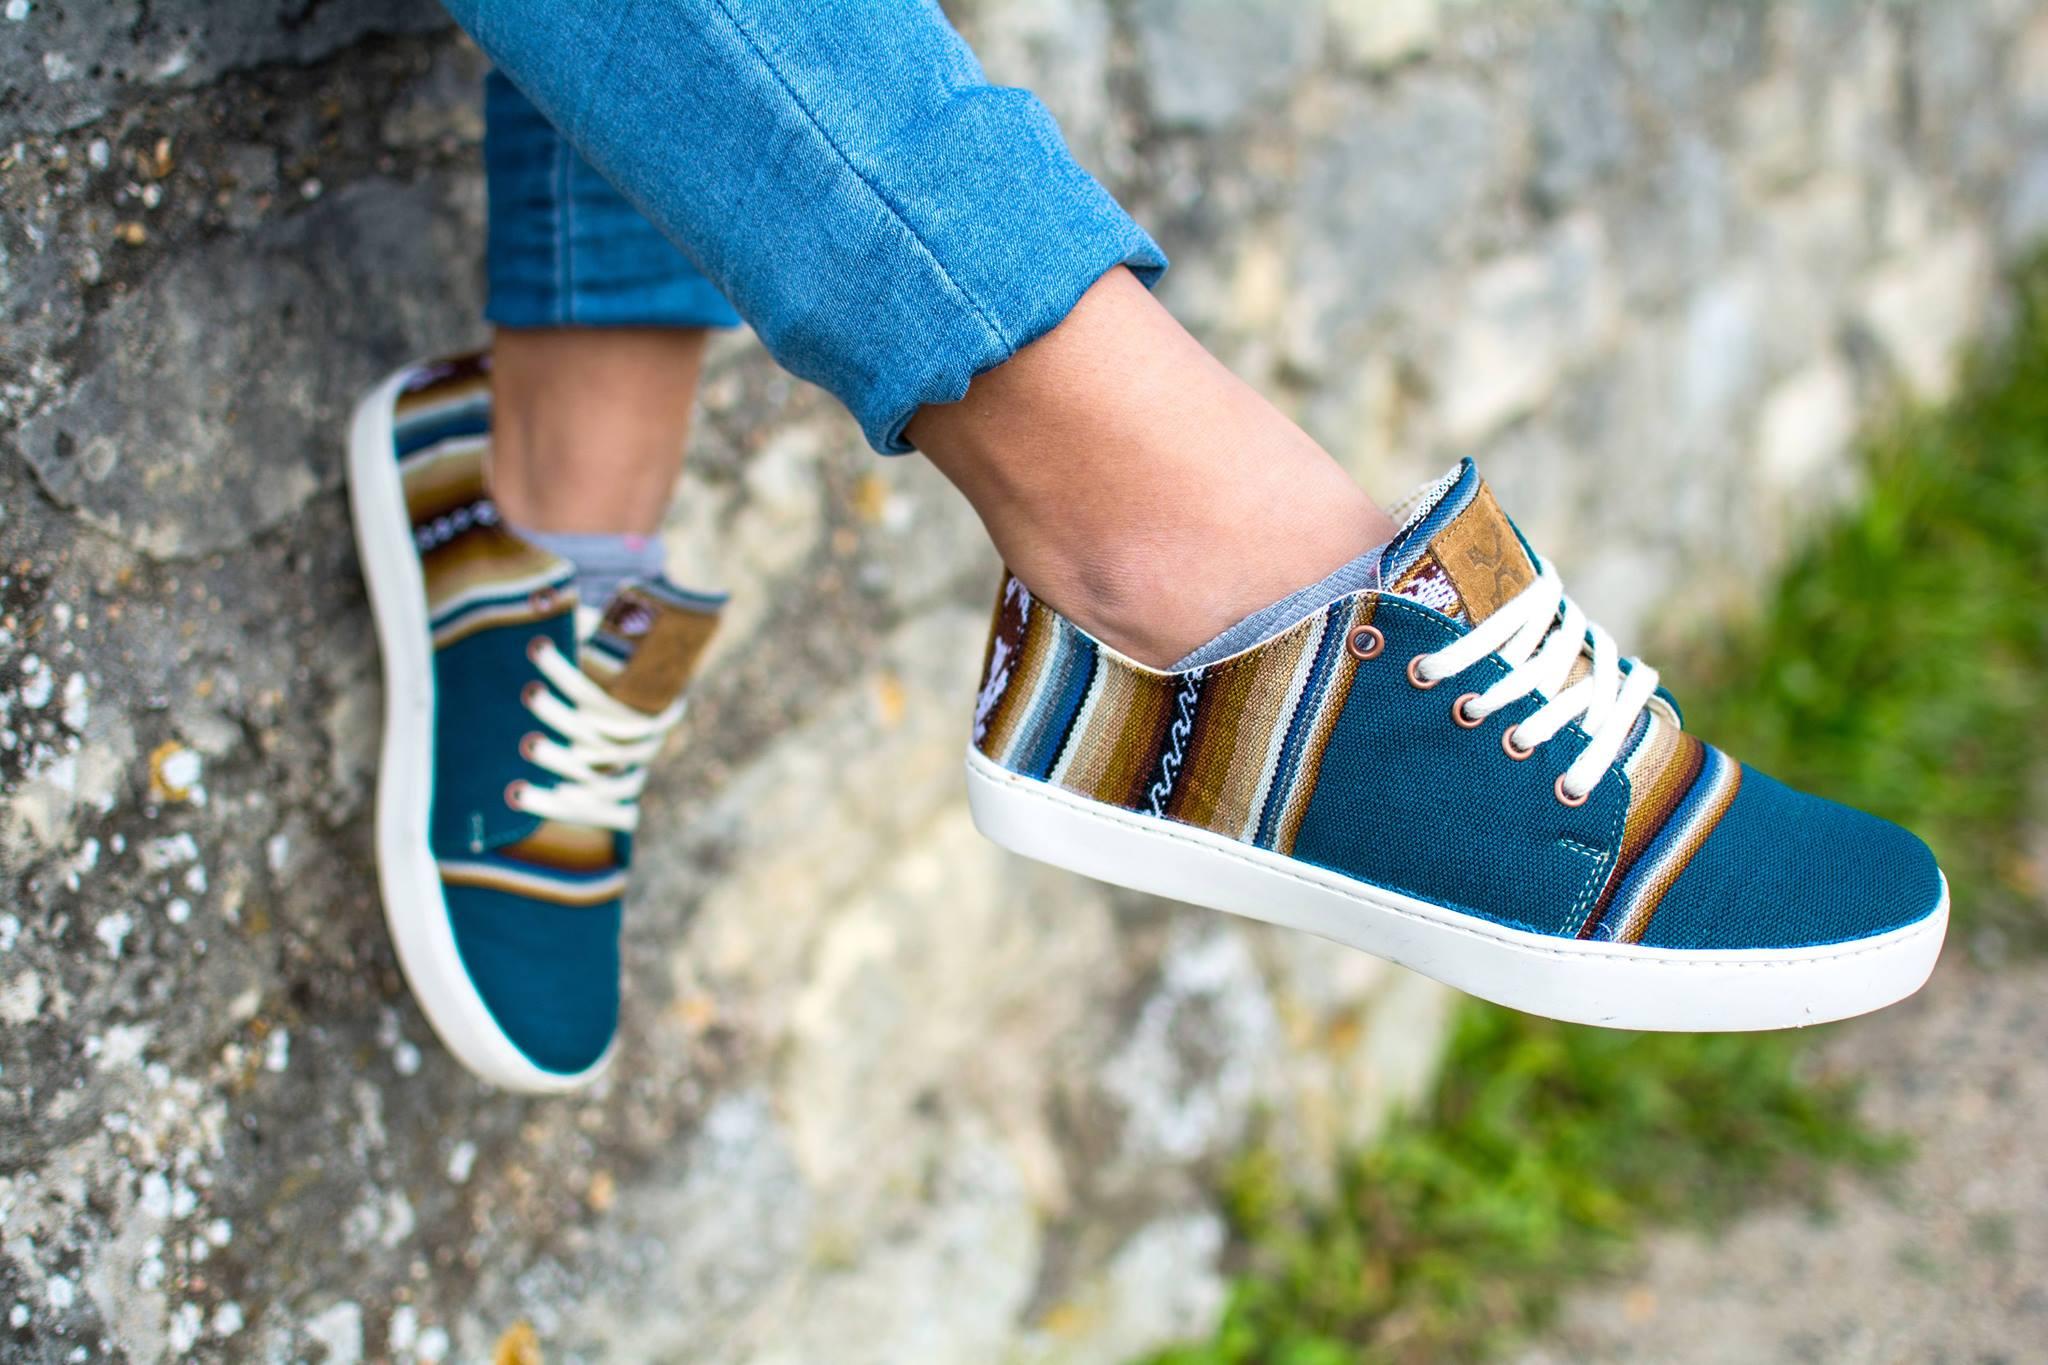 Des chaussures péruviennes solidaires